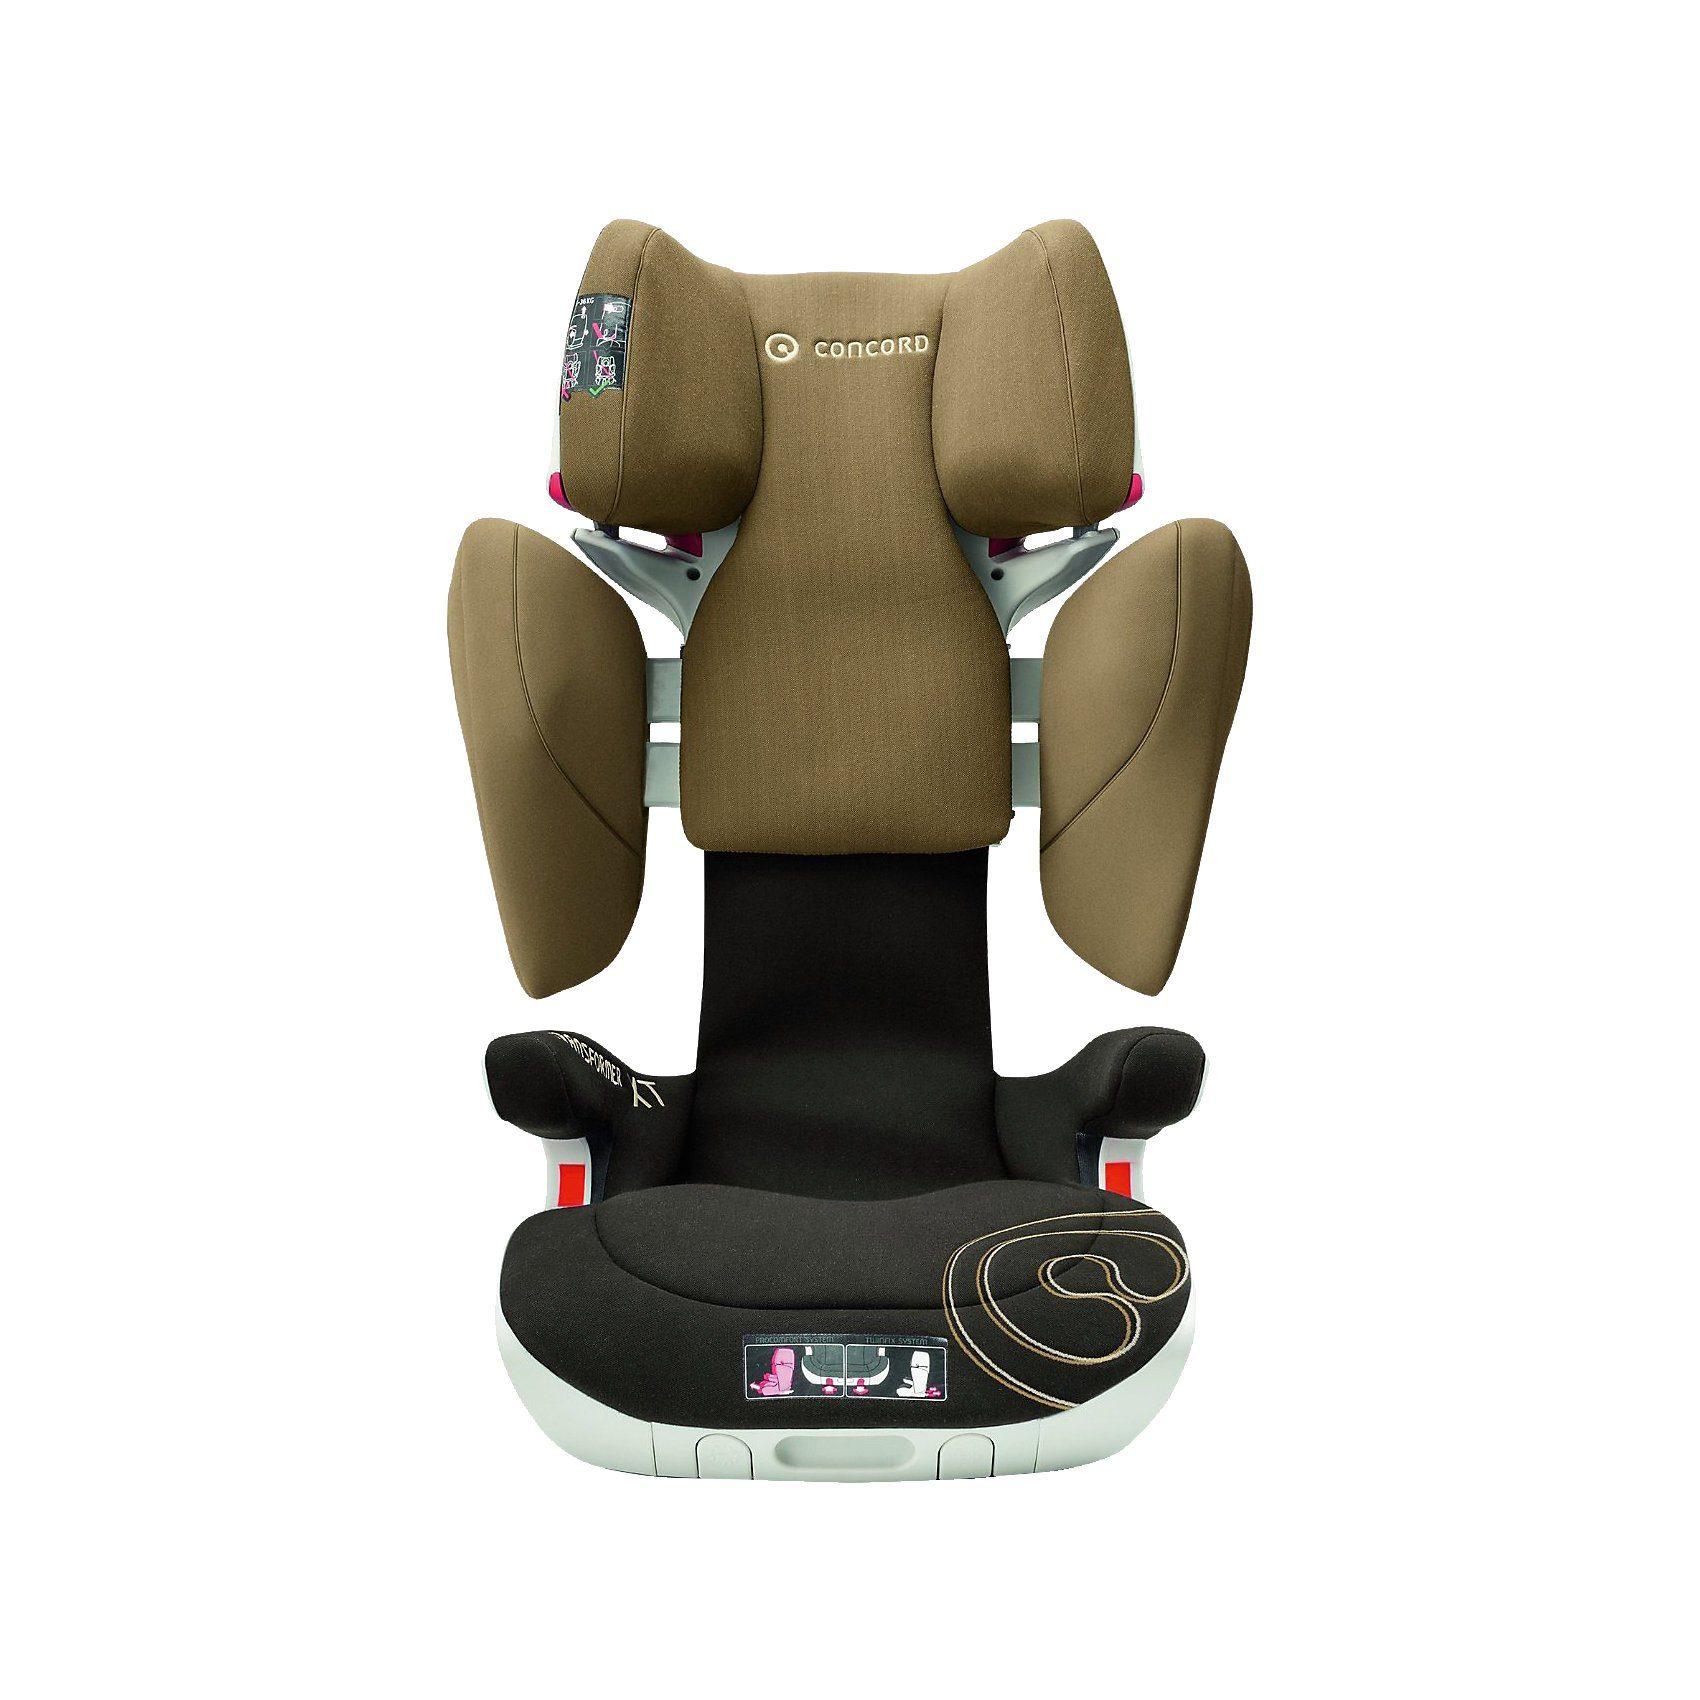 Concord Auto-Kindersitz Transformer XT, Walnut Brown, 2016